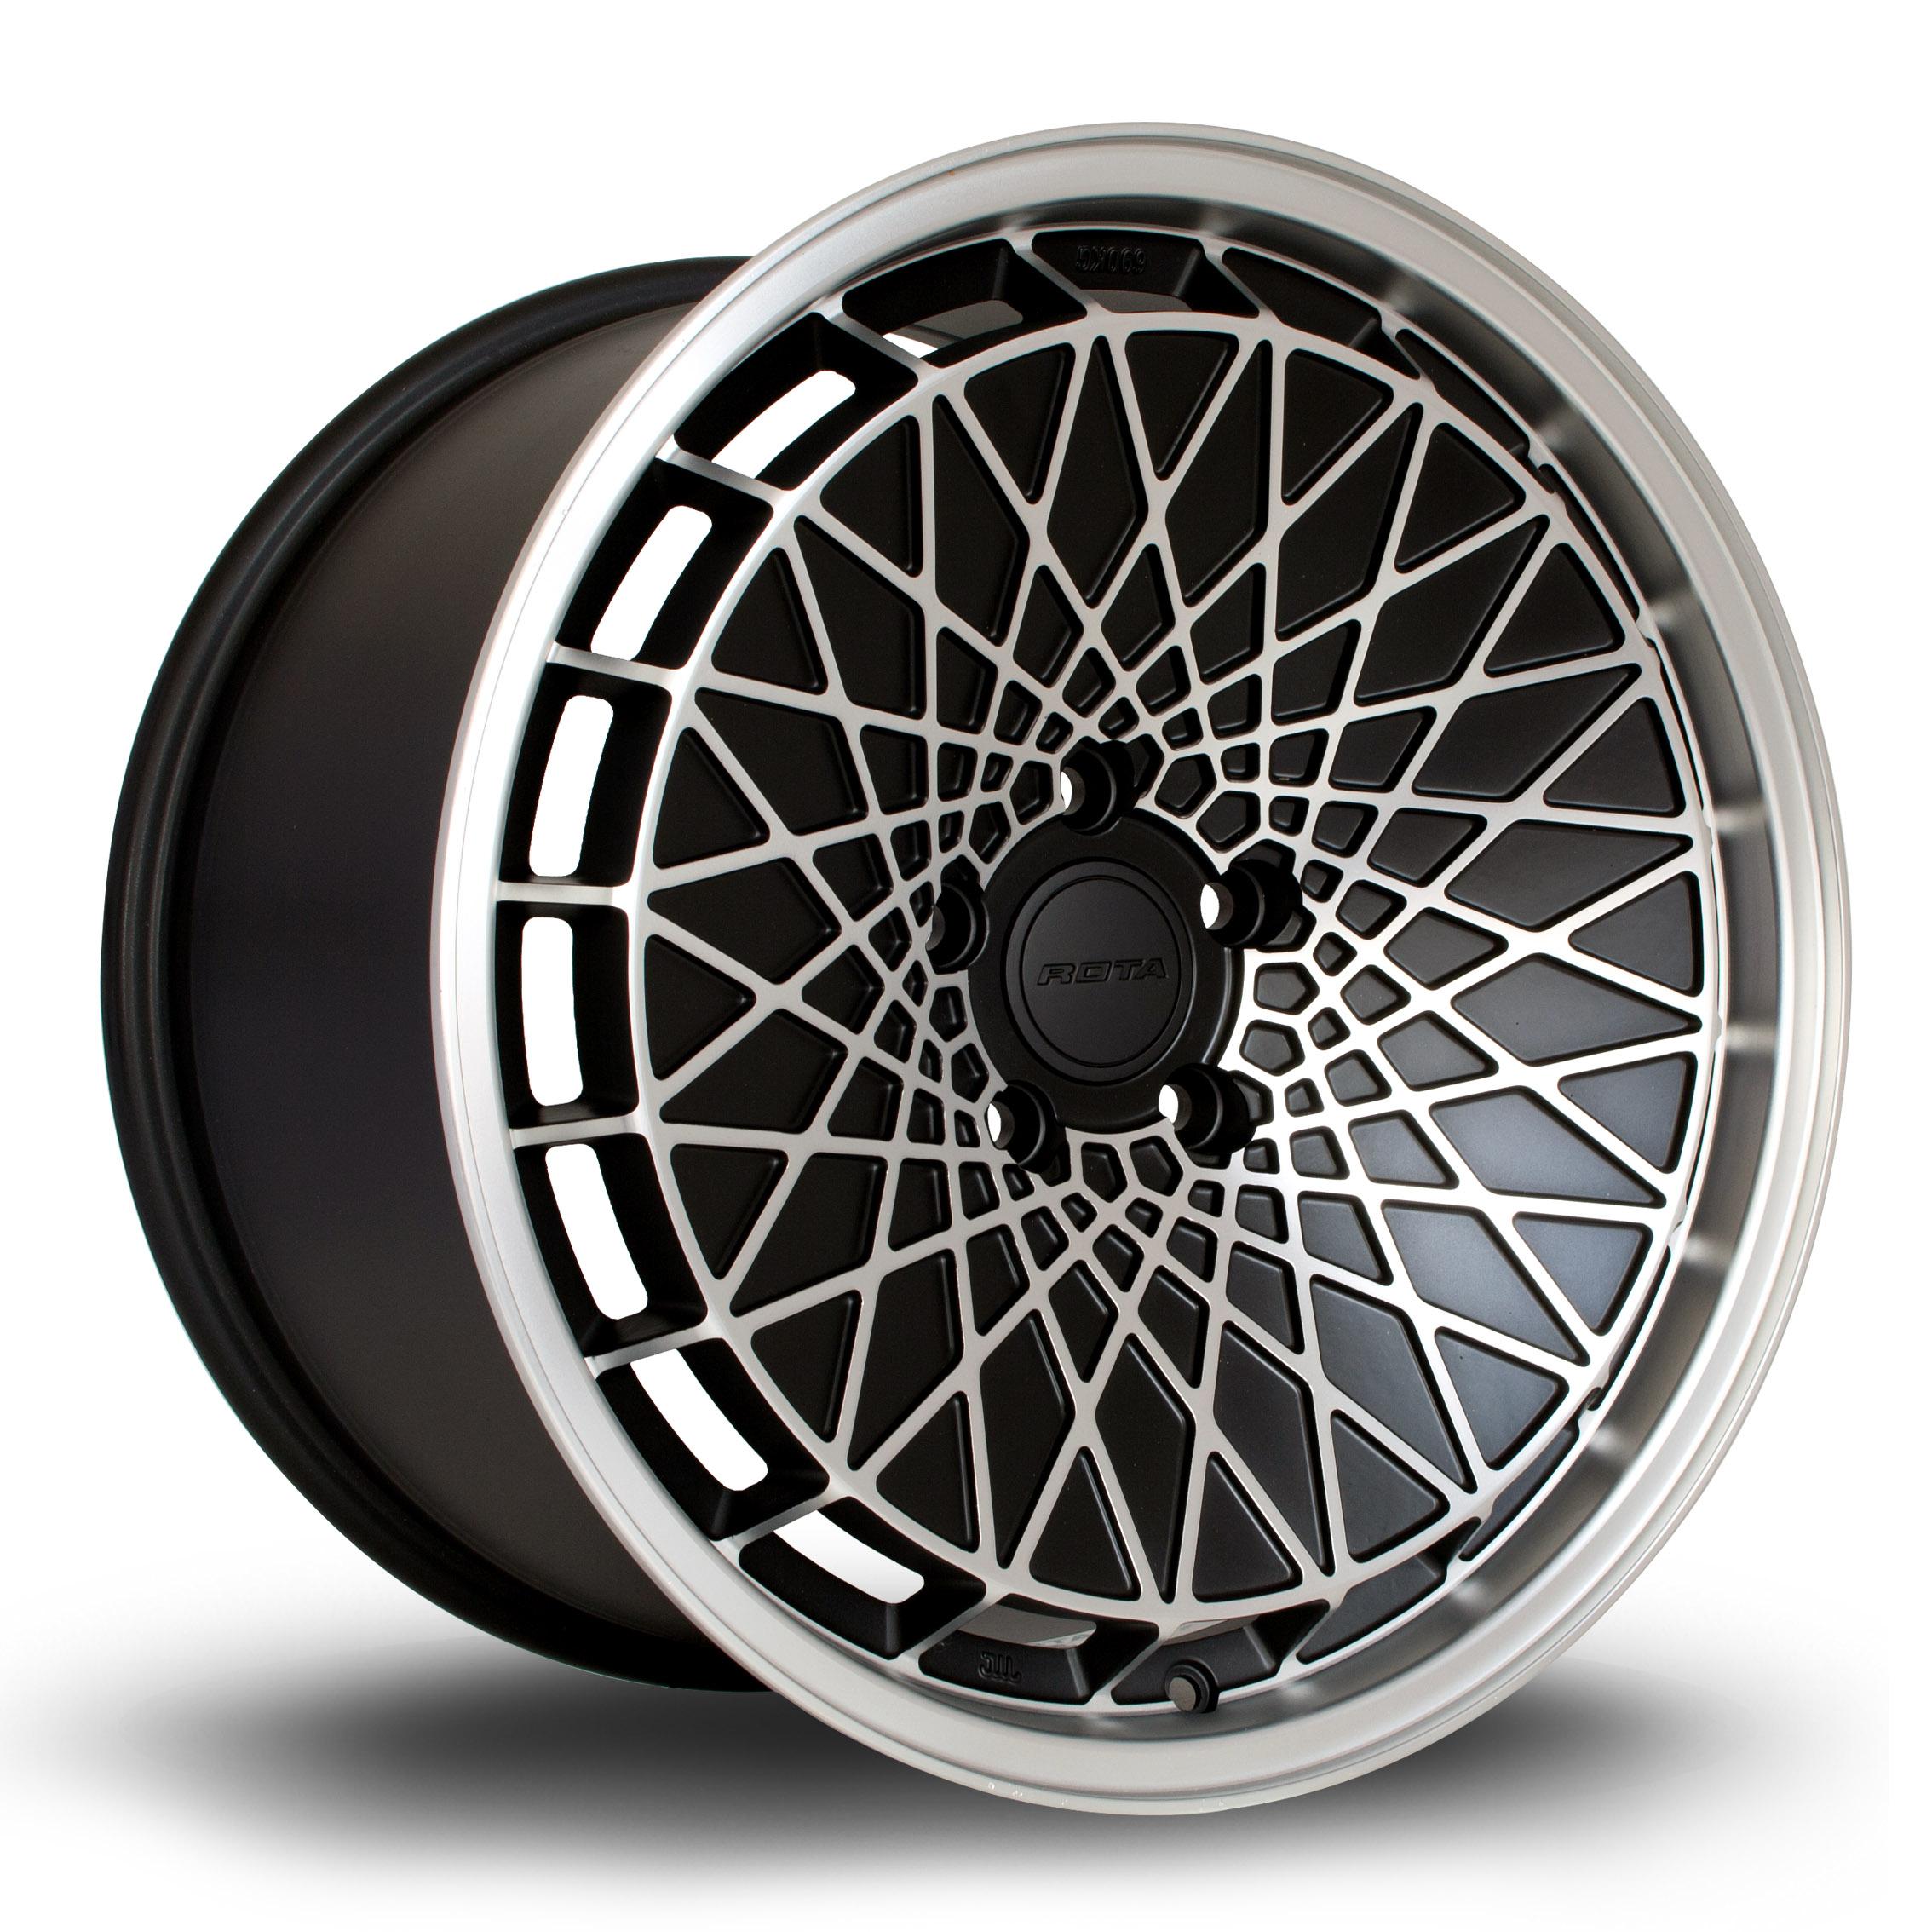 Rota RM100 wheels